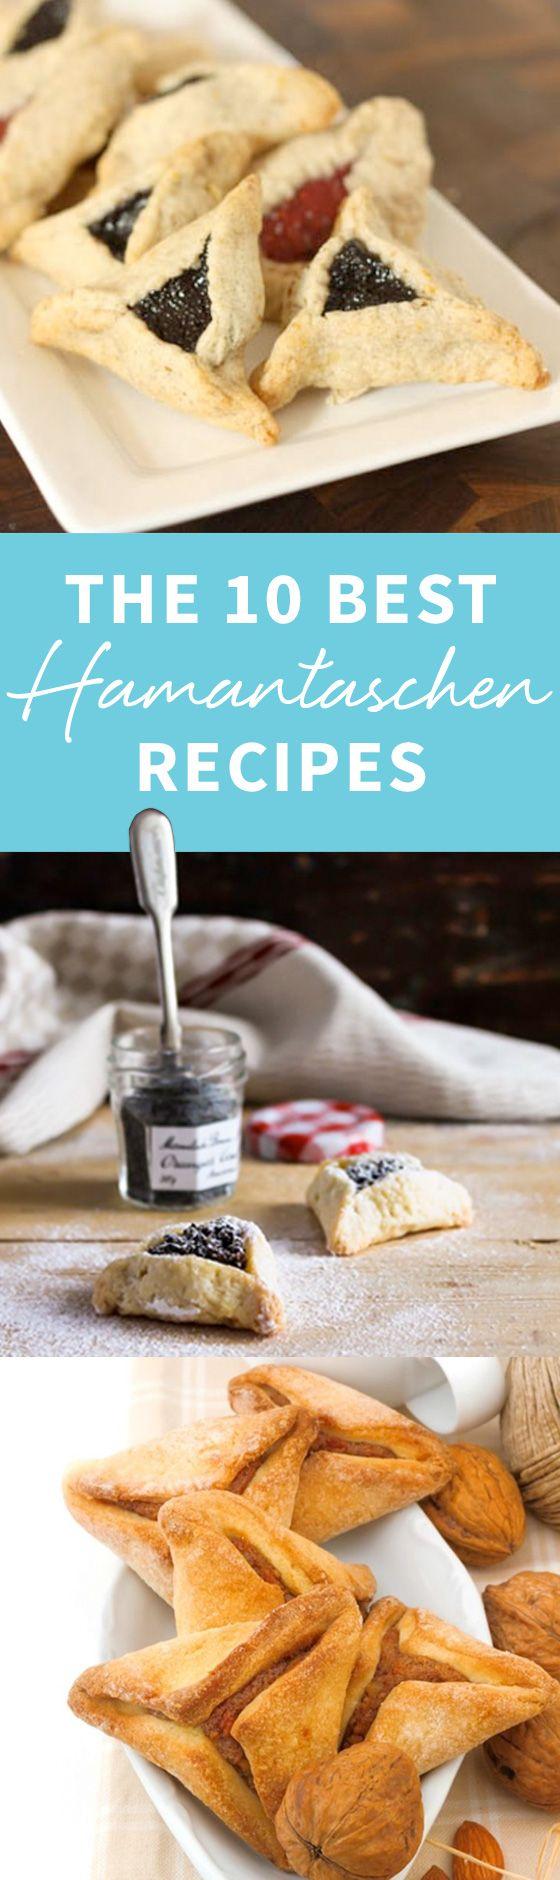 Find The Ten Best Hamantaschen Recipes here! http://www.joyofkosher.com/2017/02/top-ten-hamantash-recipes/